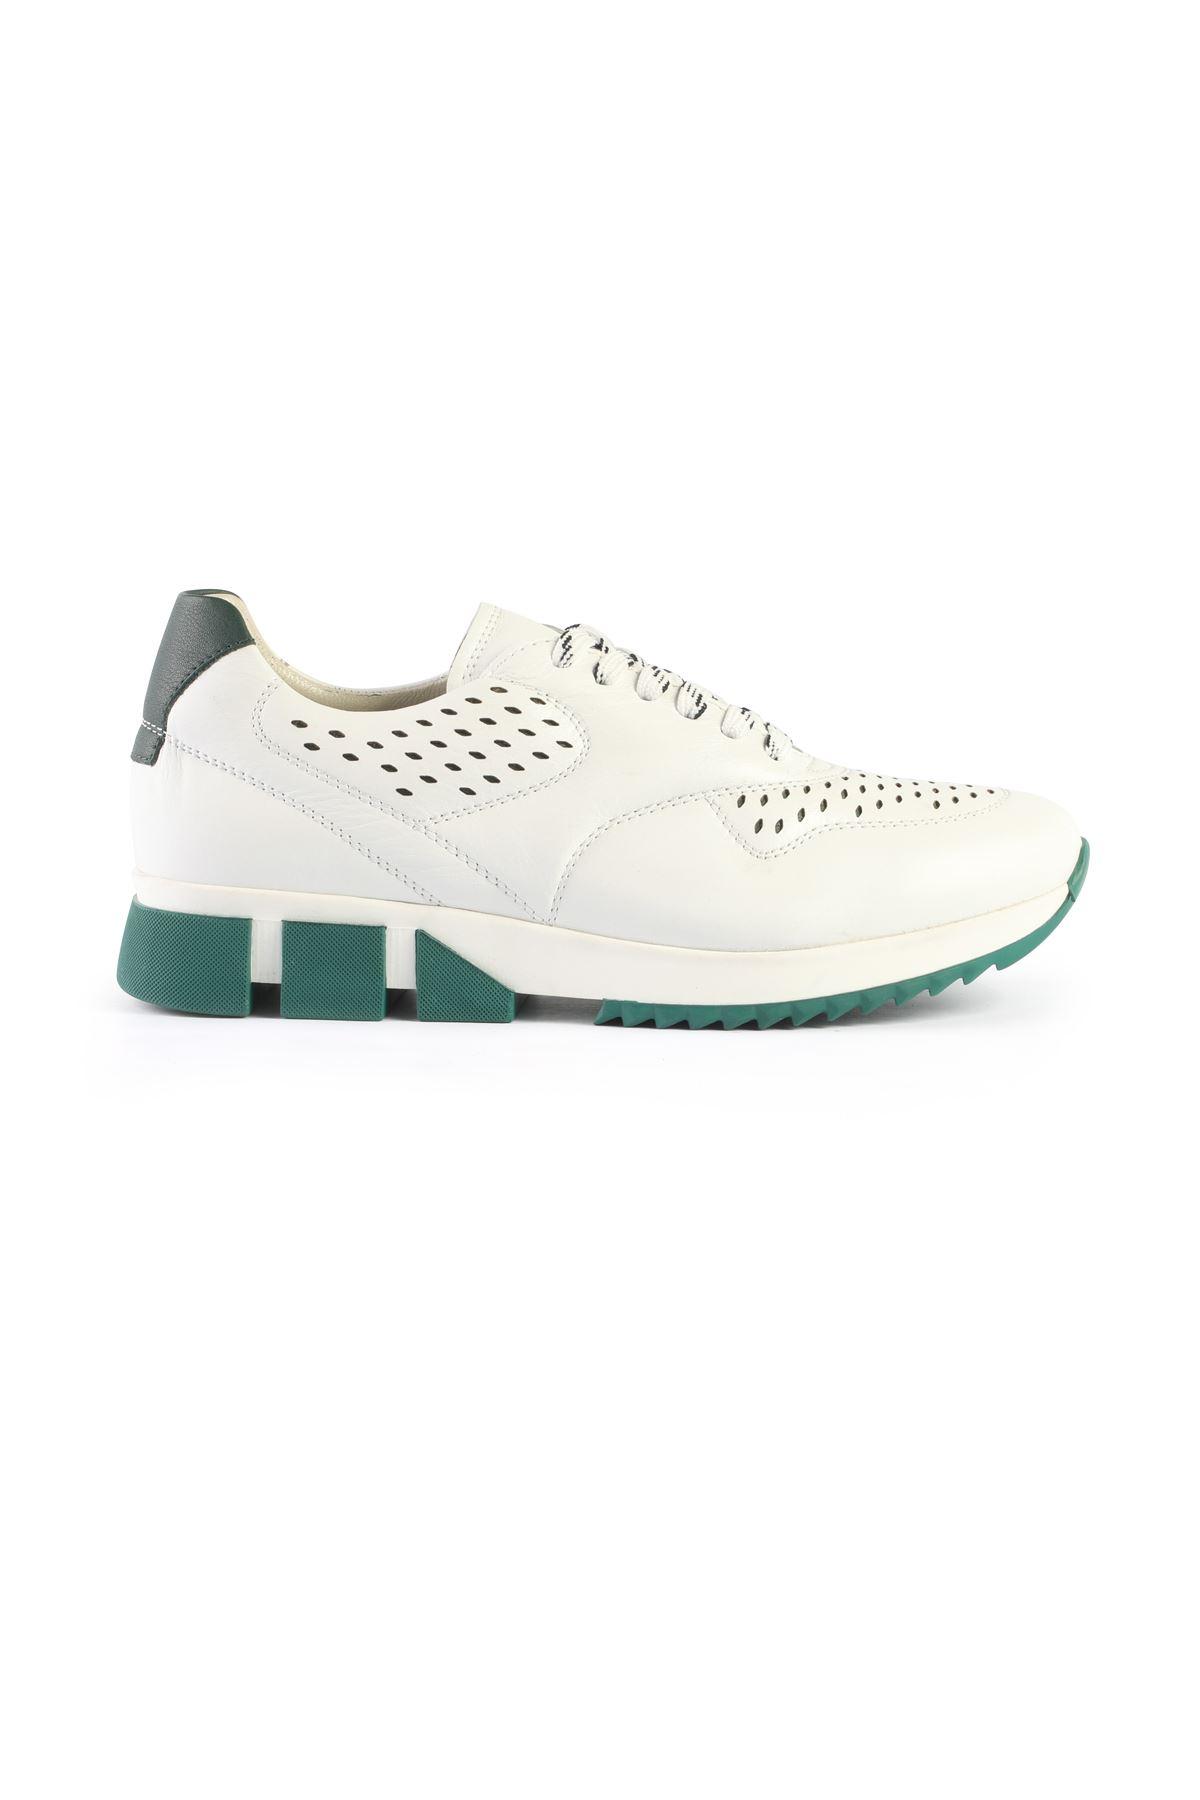 Libero 3392 B.Green Sports Shoes